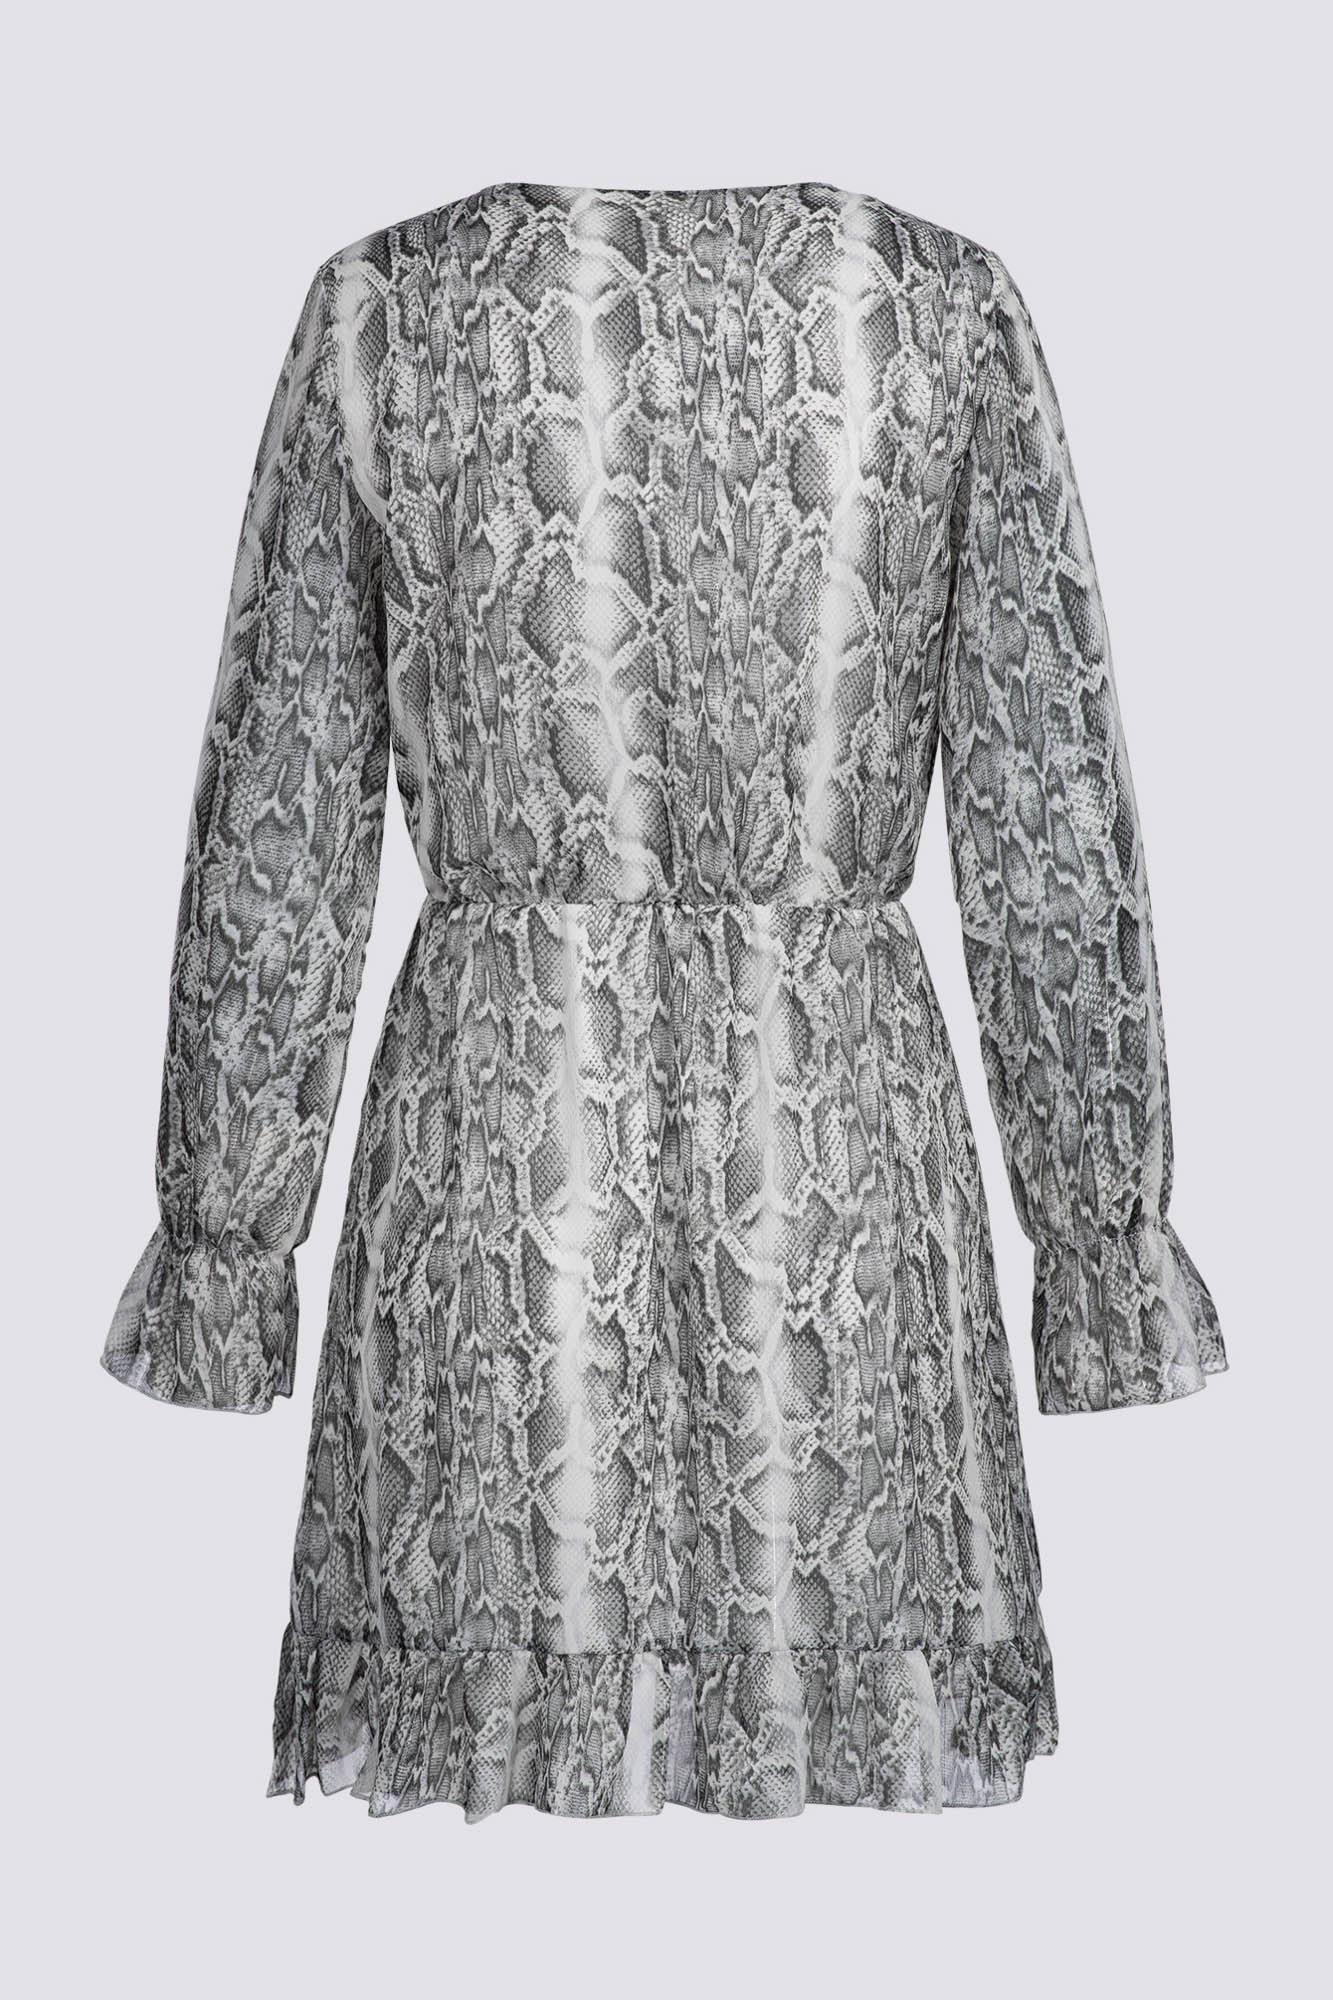 Kleid In Wickeloptik Mit Schlangenmuster  Freshlions